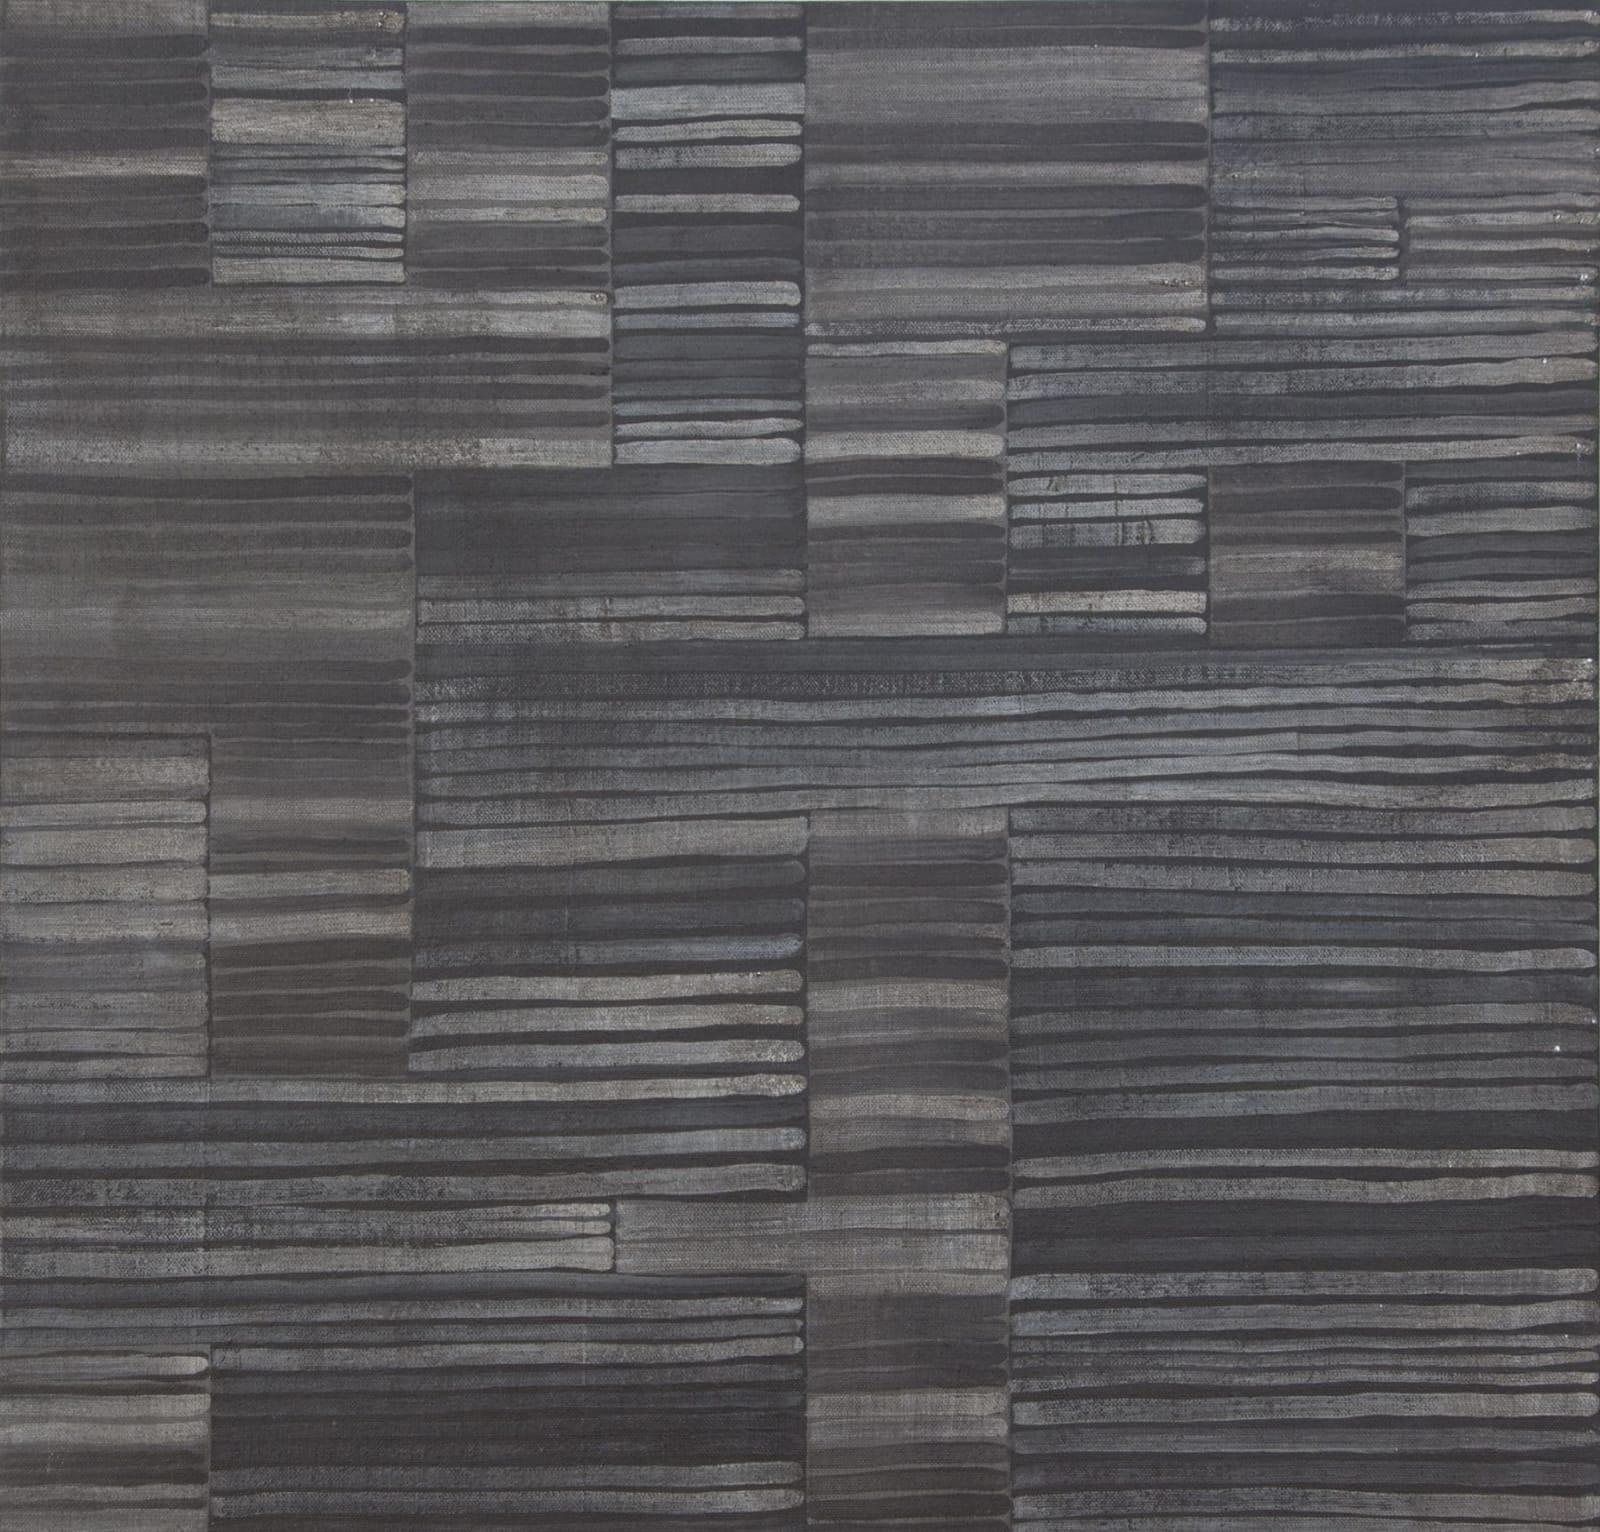 Huguette Caland, Untitled, 2000